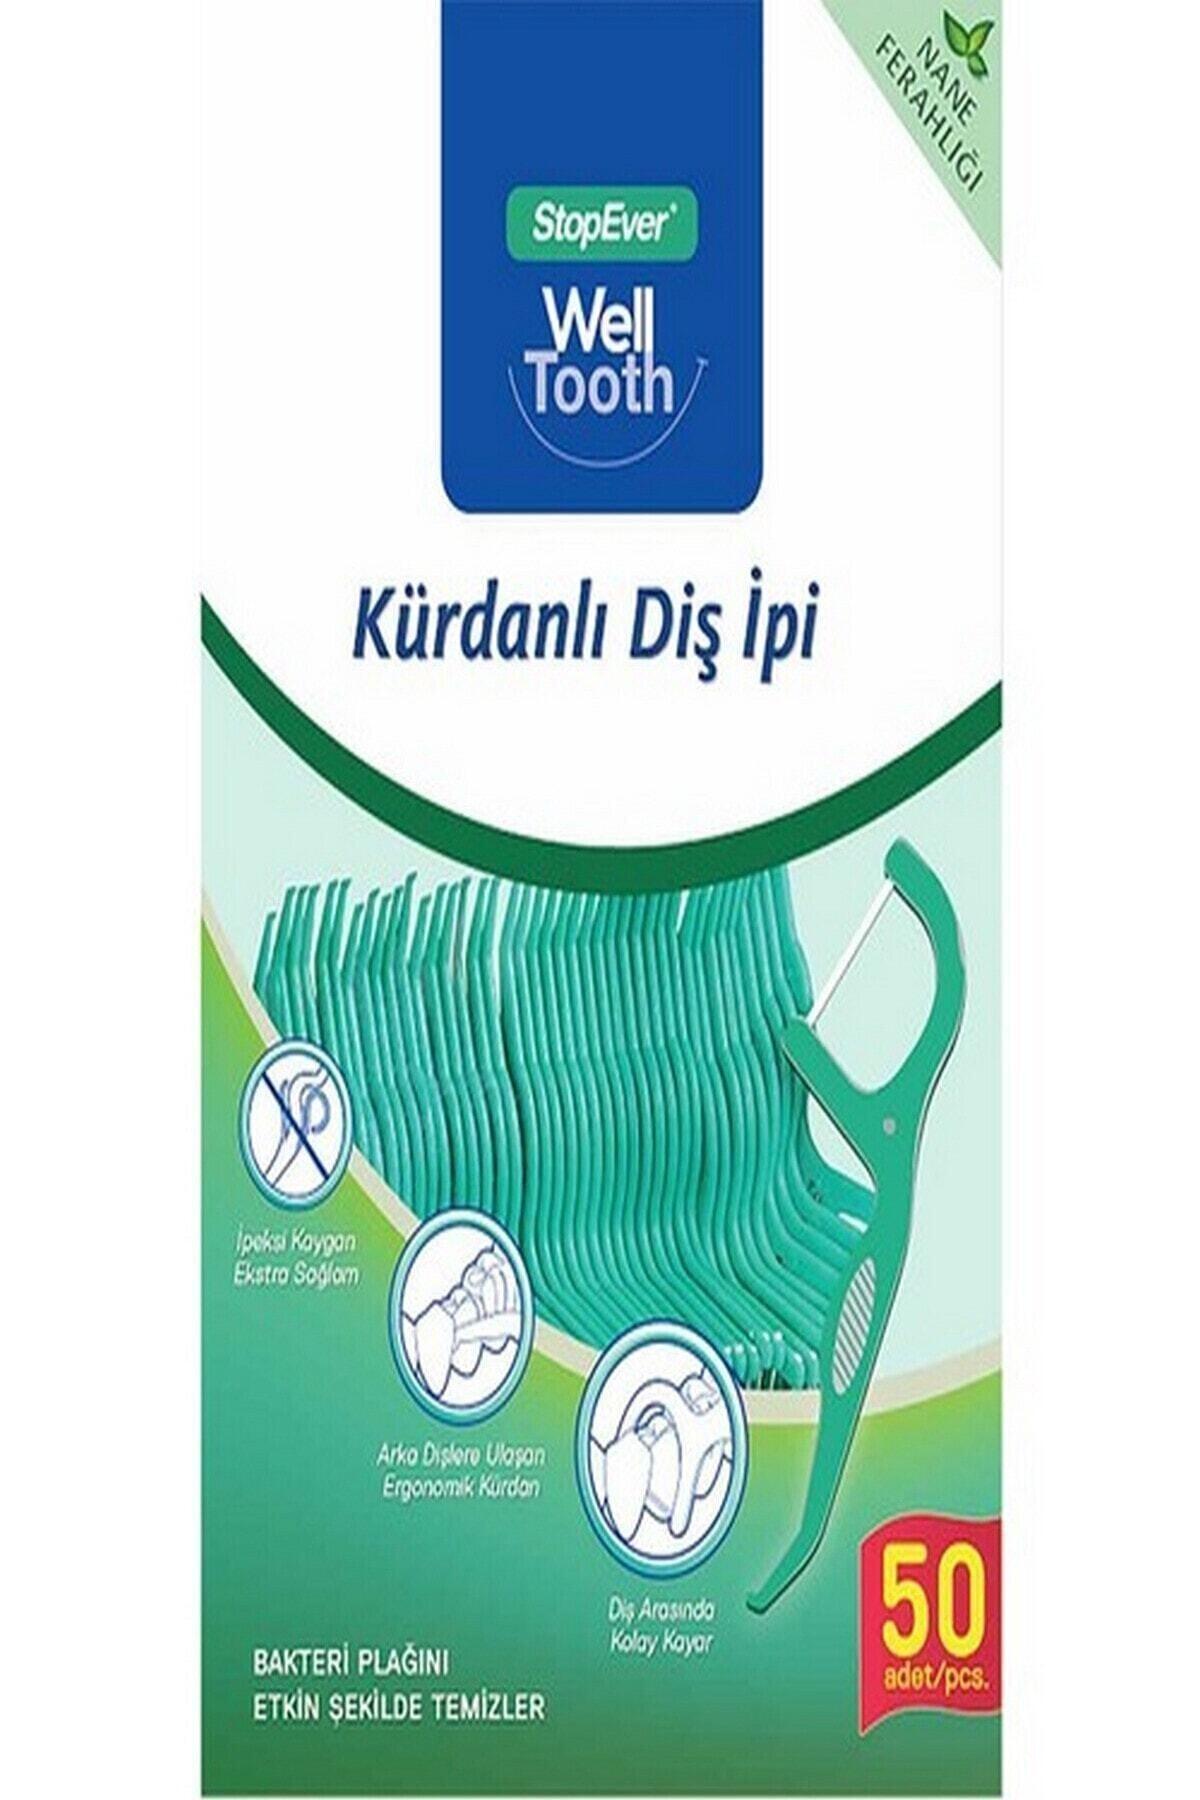 StopEver Well Tooth Kürdanlı Diş Ipi 2